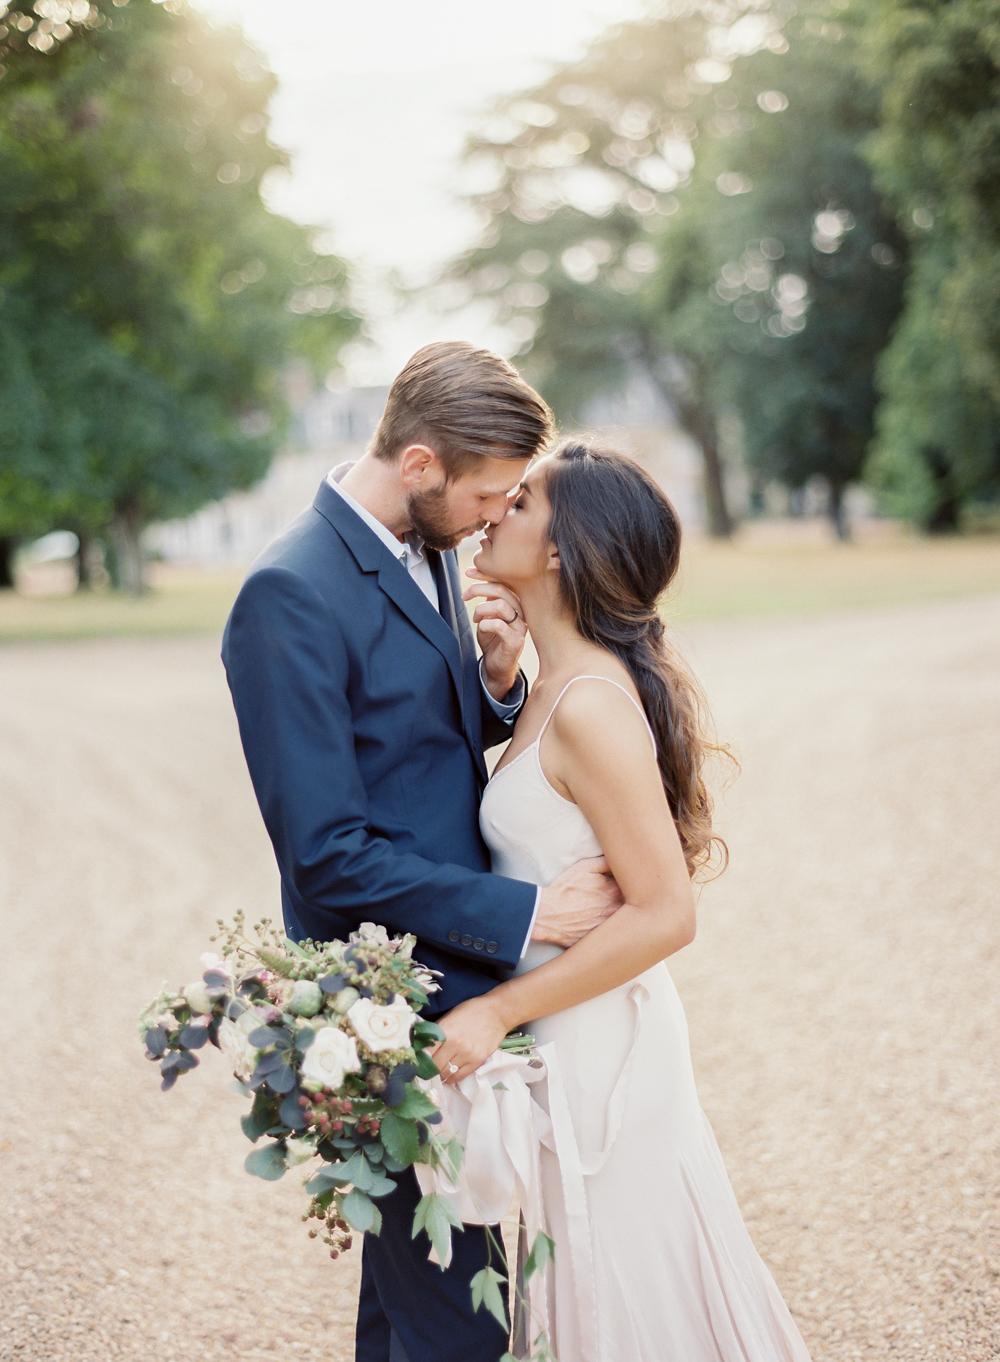 Vicki Grafton Photography Fine Art Film Destination Wedding Photographer | Intimate French Chateau Wedding